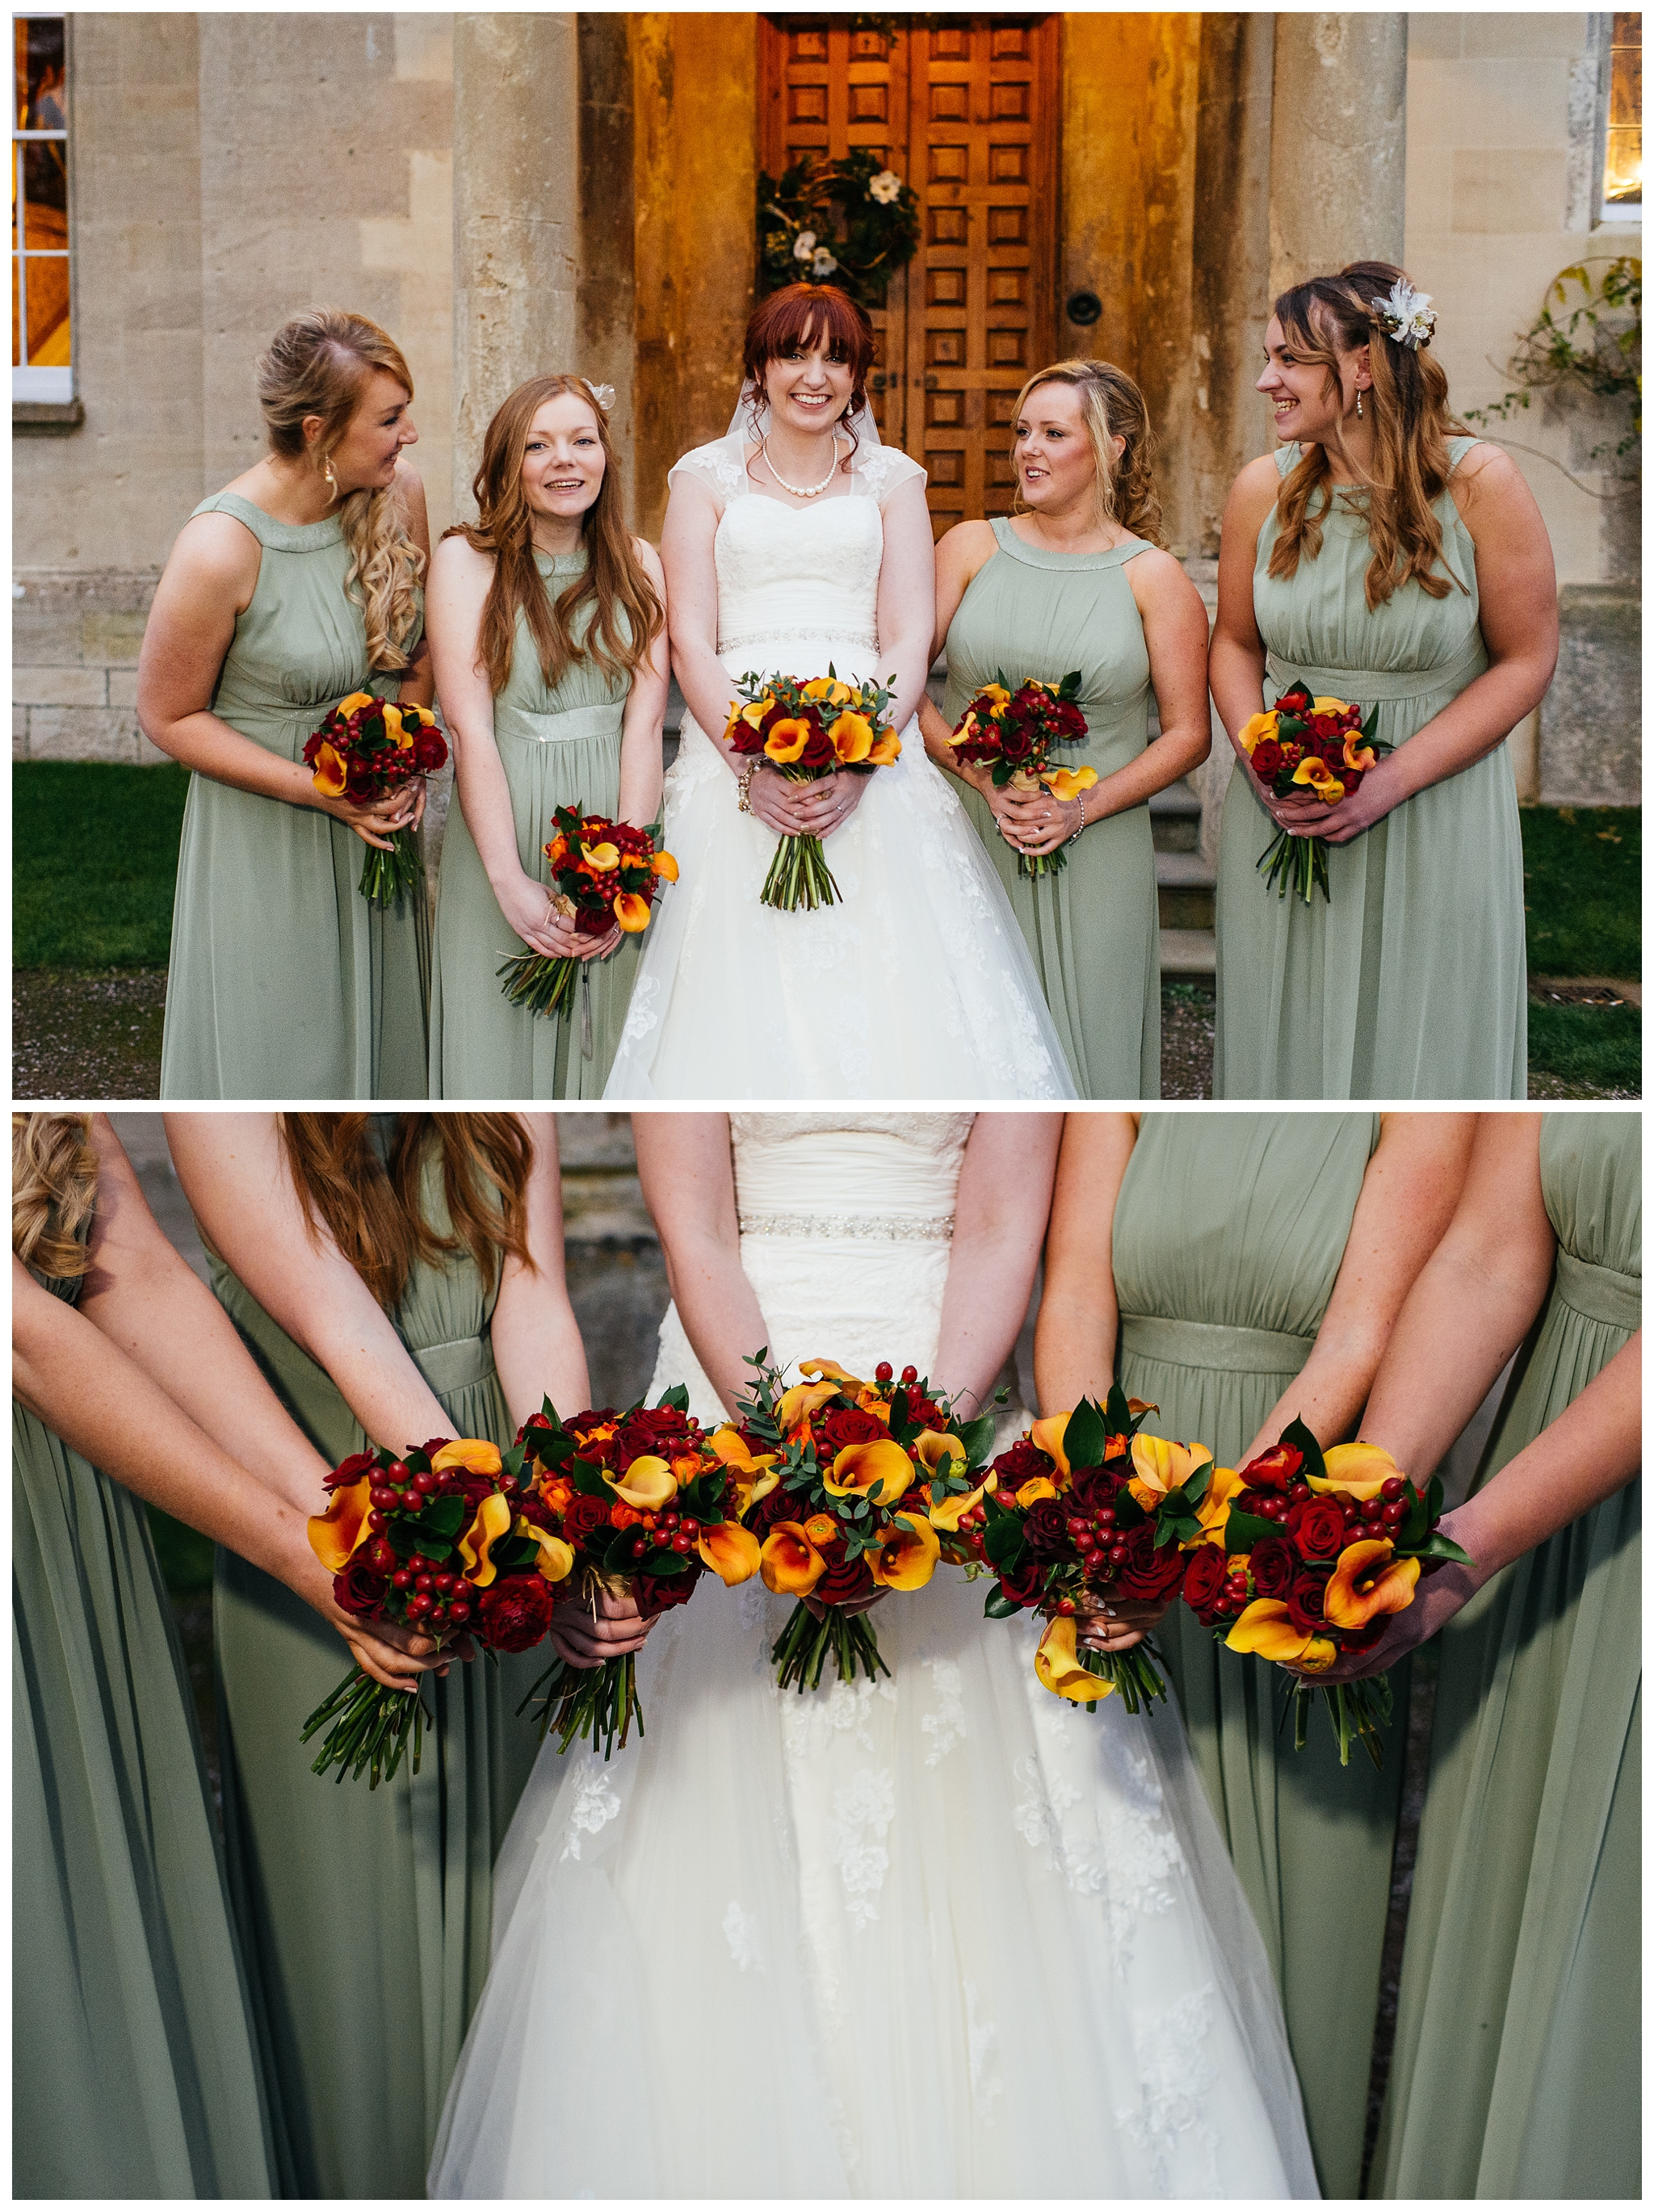 Emma&Paul-Elmore-Court-Winter-Wedding-Nikki-Cooper-Photography_0078.jpg